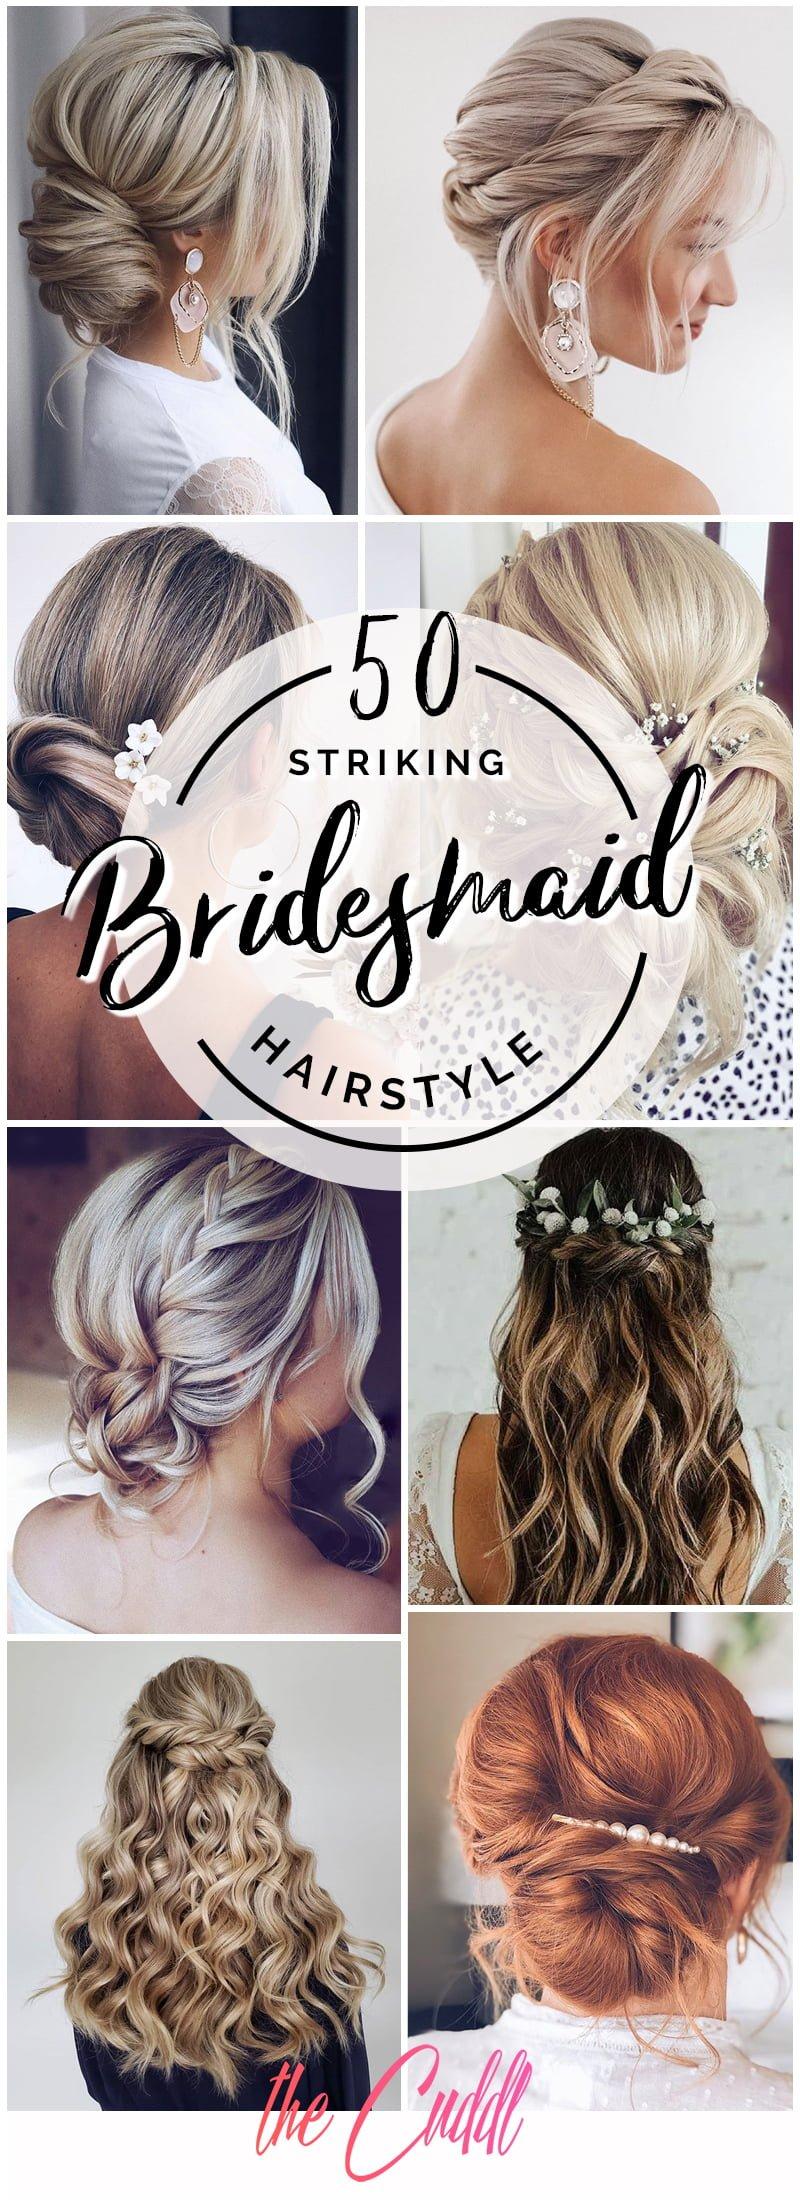 Best Bridesmaid Hairstyle Ideas